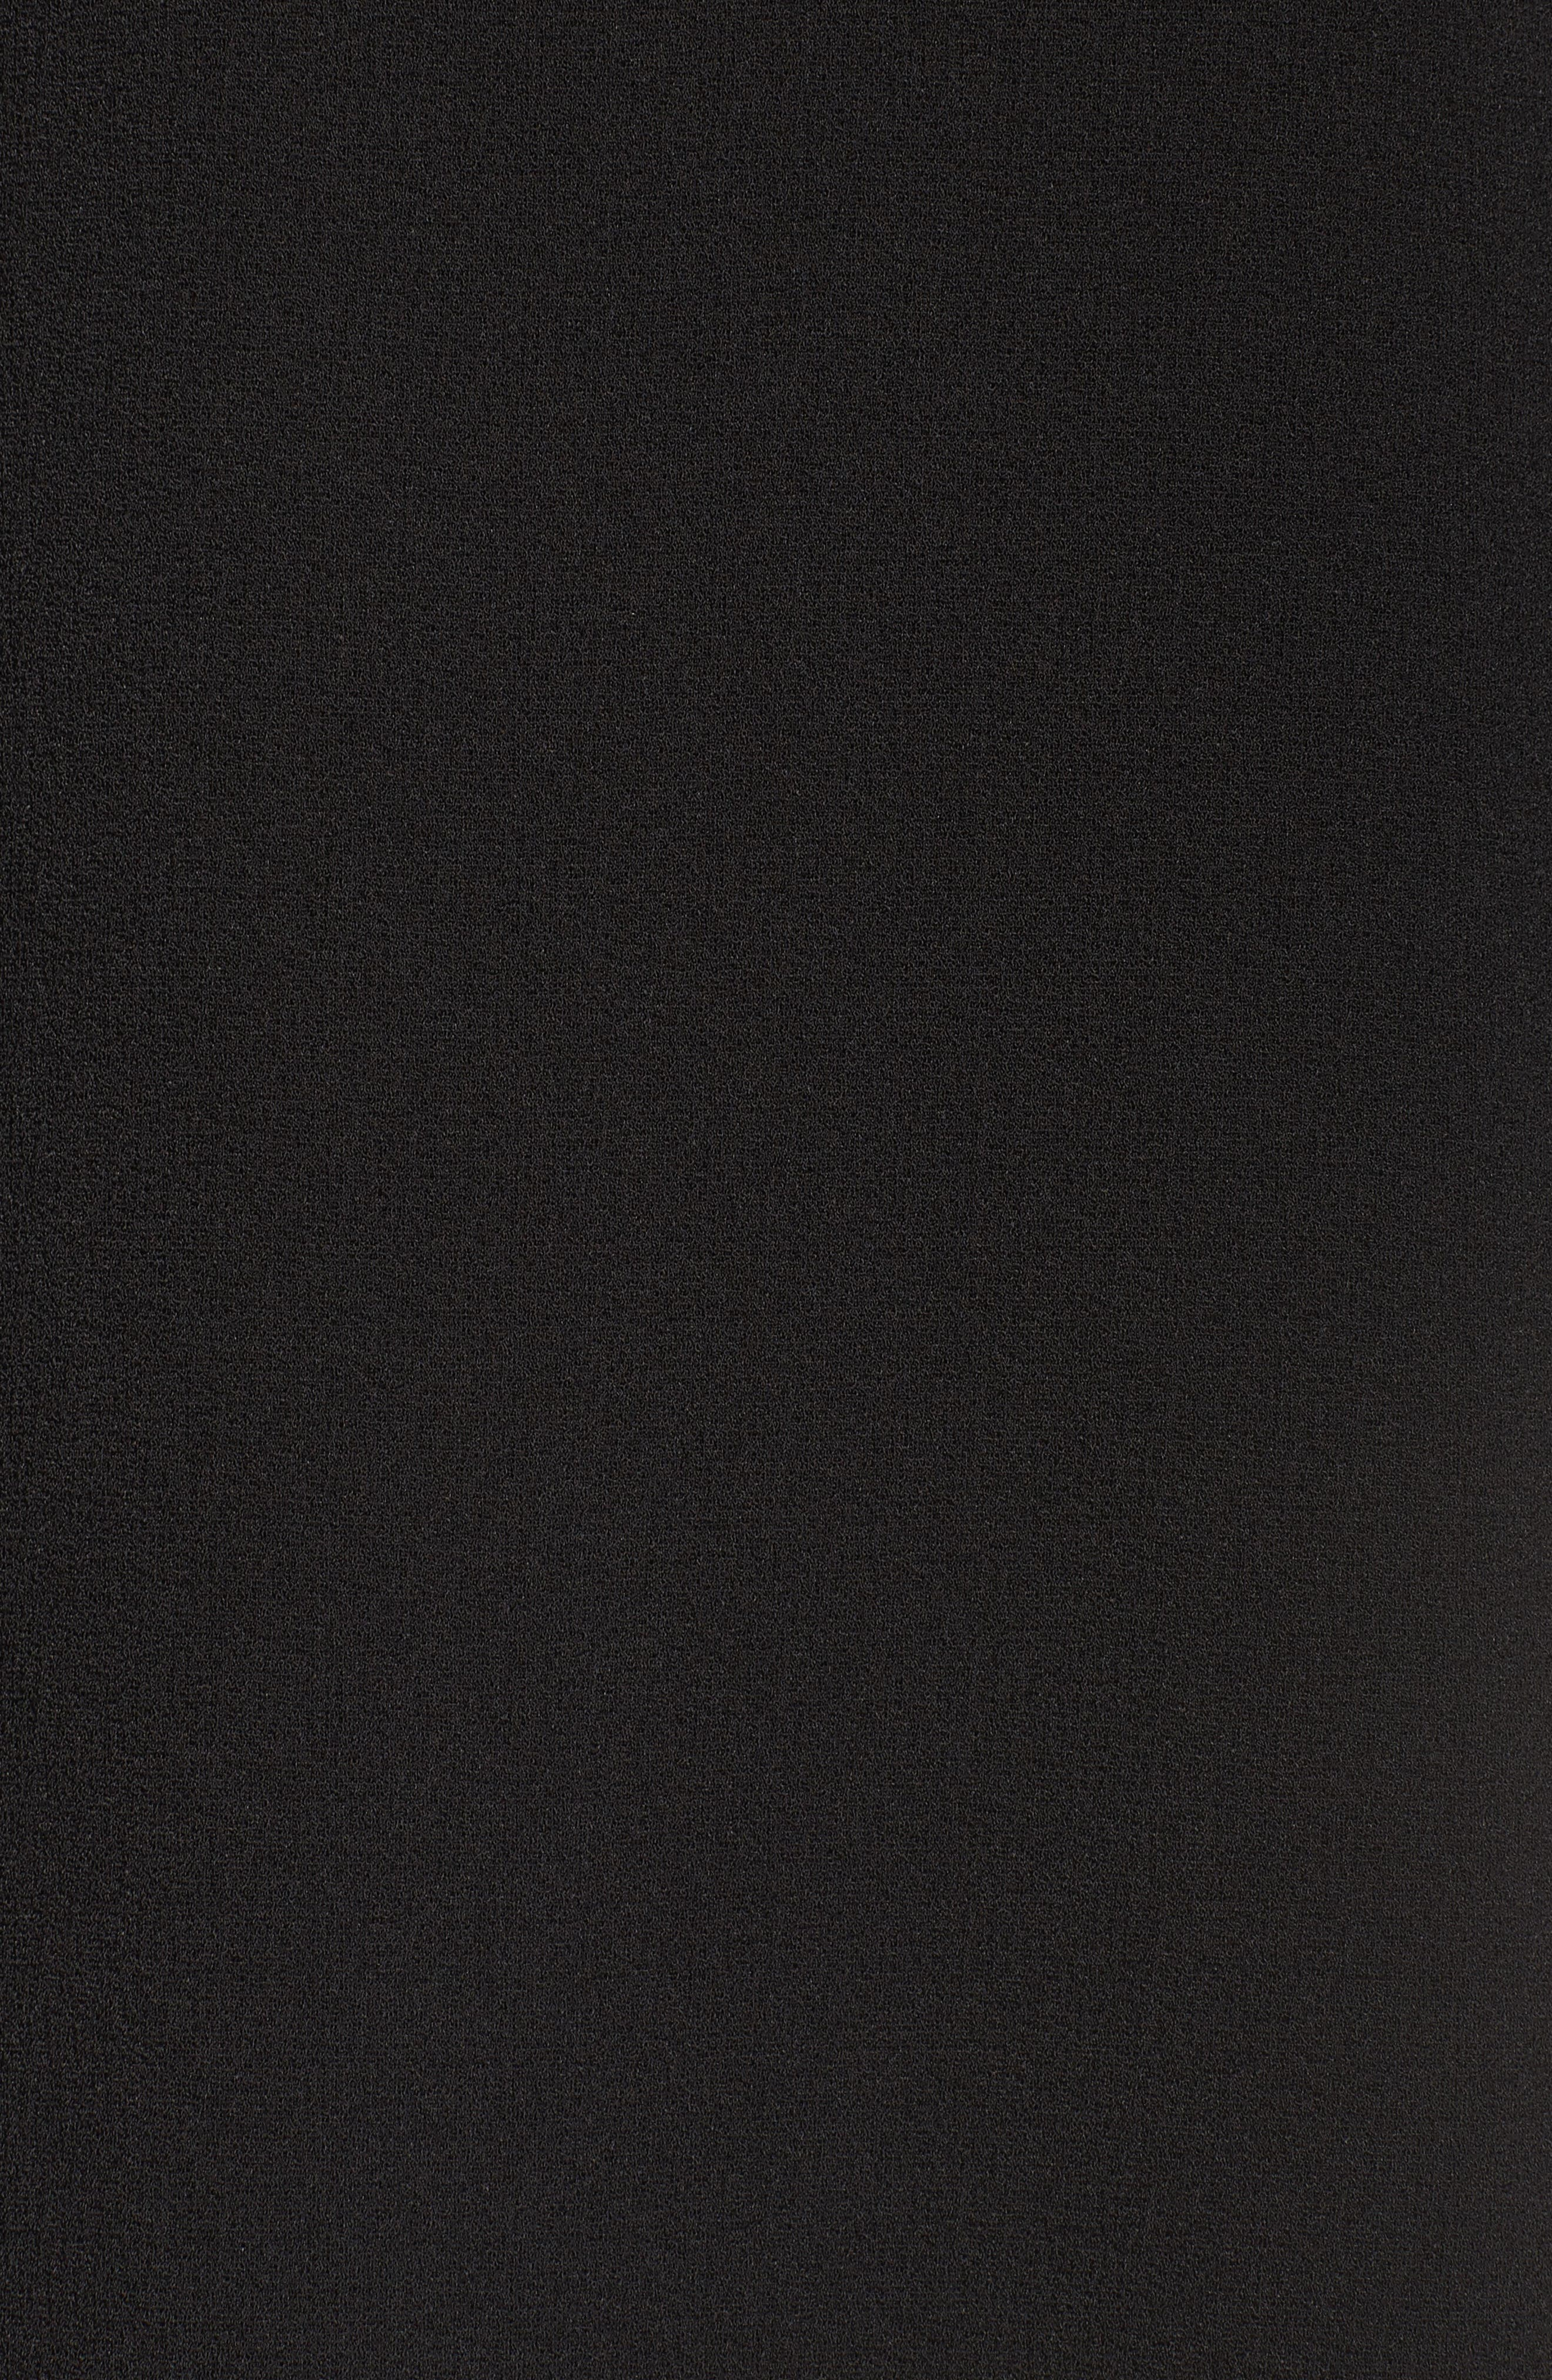 Ruffle Sleeve Shift Dress,                             Alternate thumbnail 5, color,                             Black